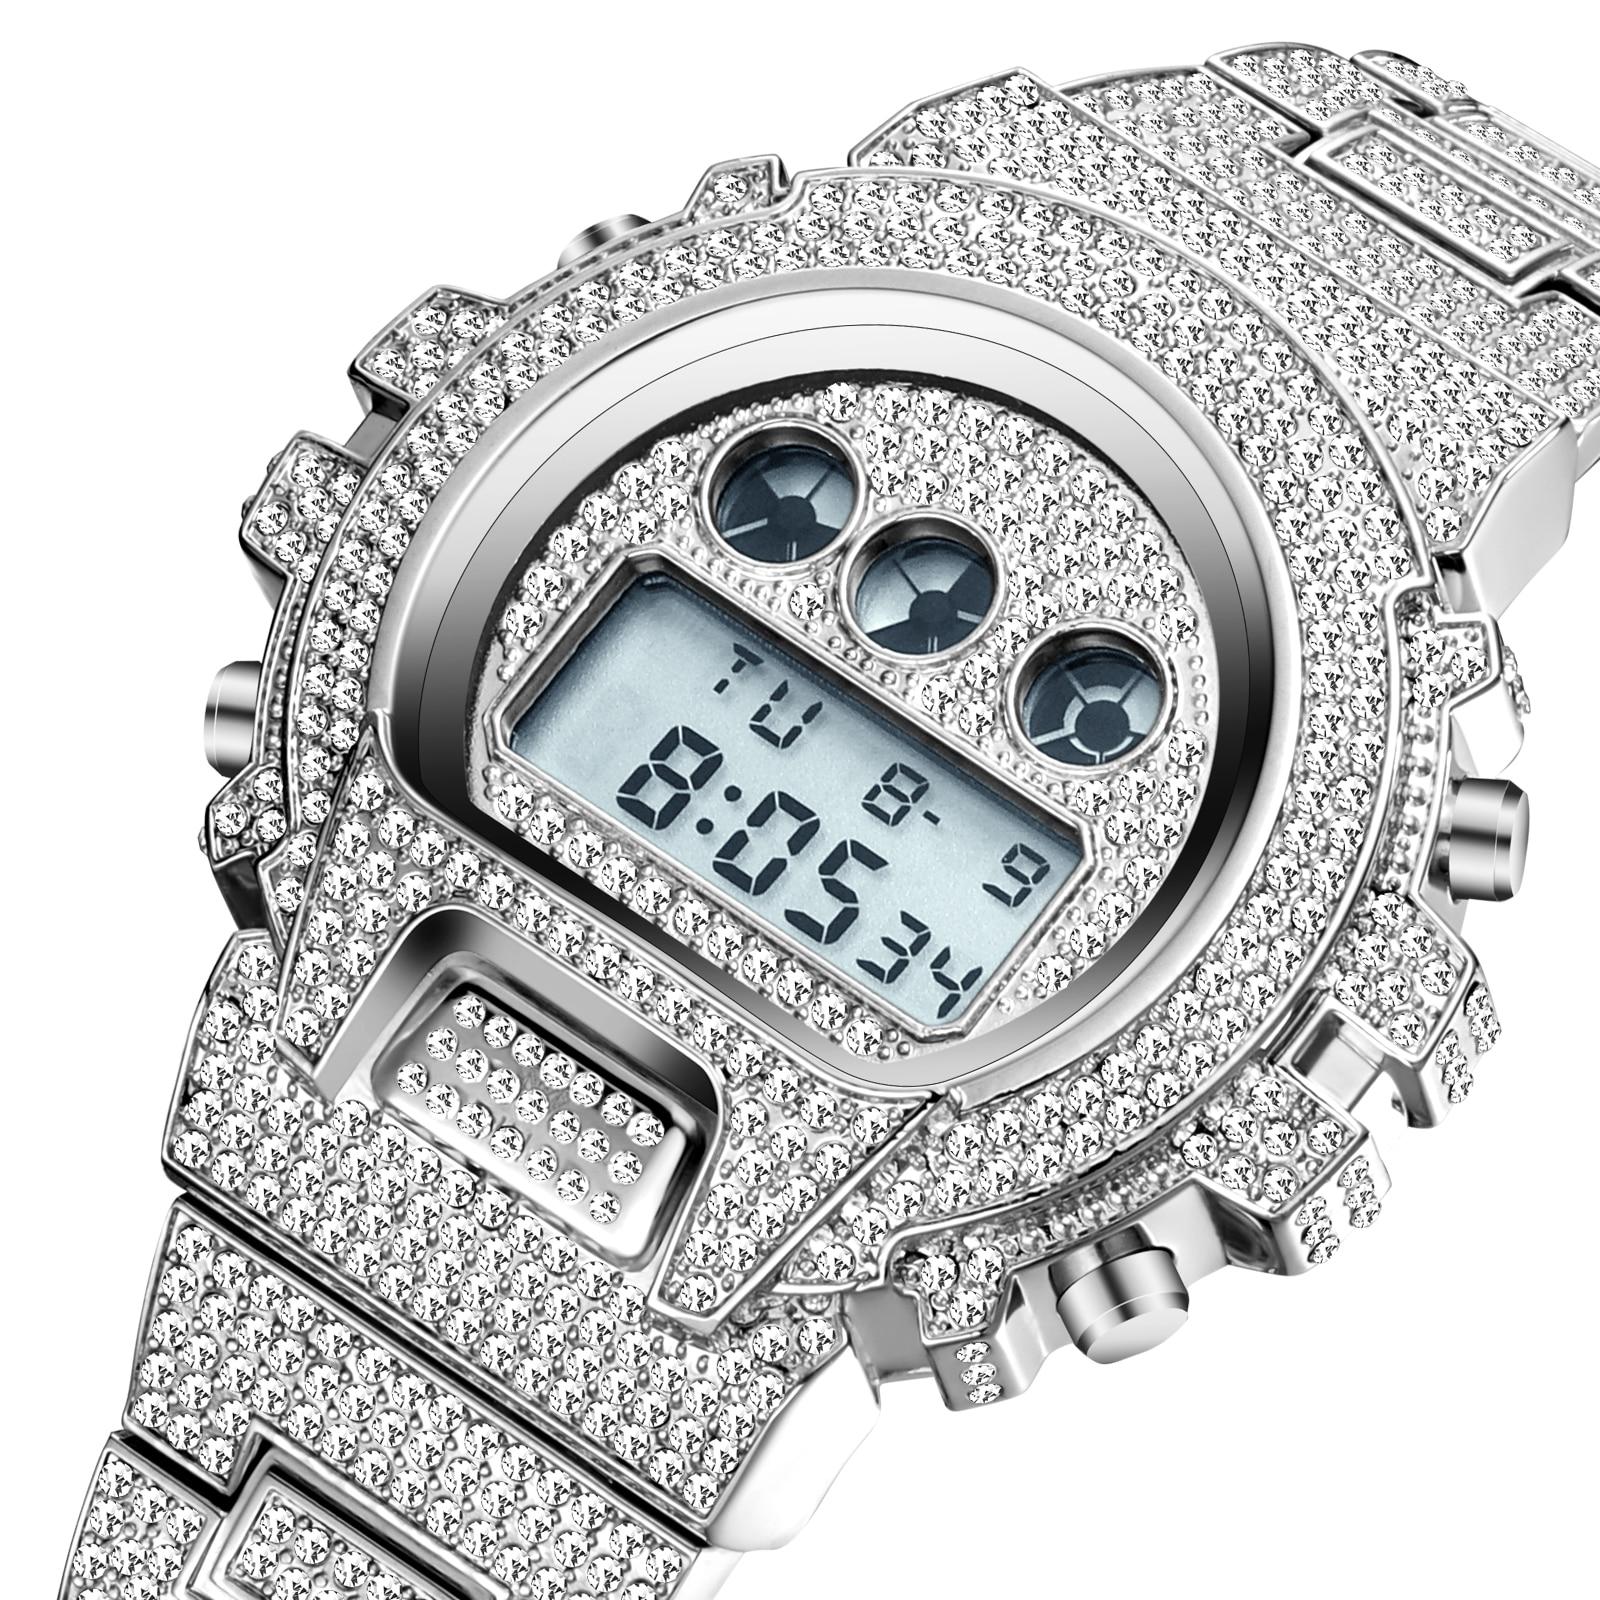 MISSFOX multifunction digital mens relógios led luz à prova de choque à prova dwaterproof água relógio masculino rado conjunto diamante completo relógio para presente masculino